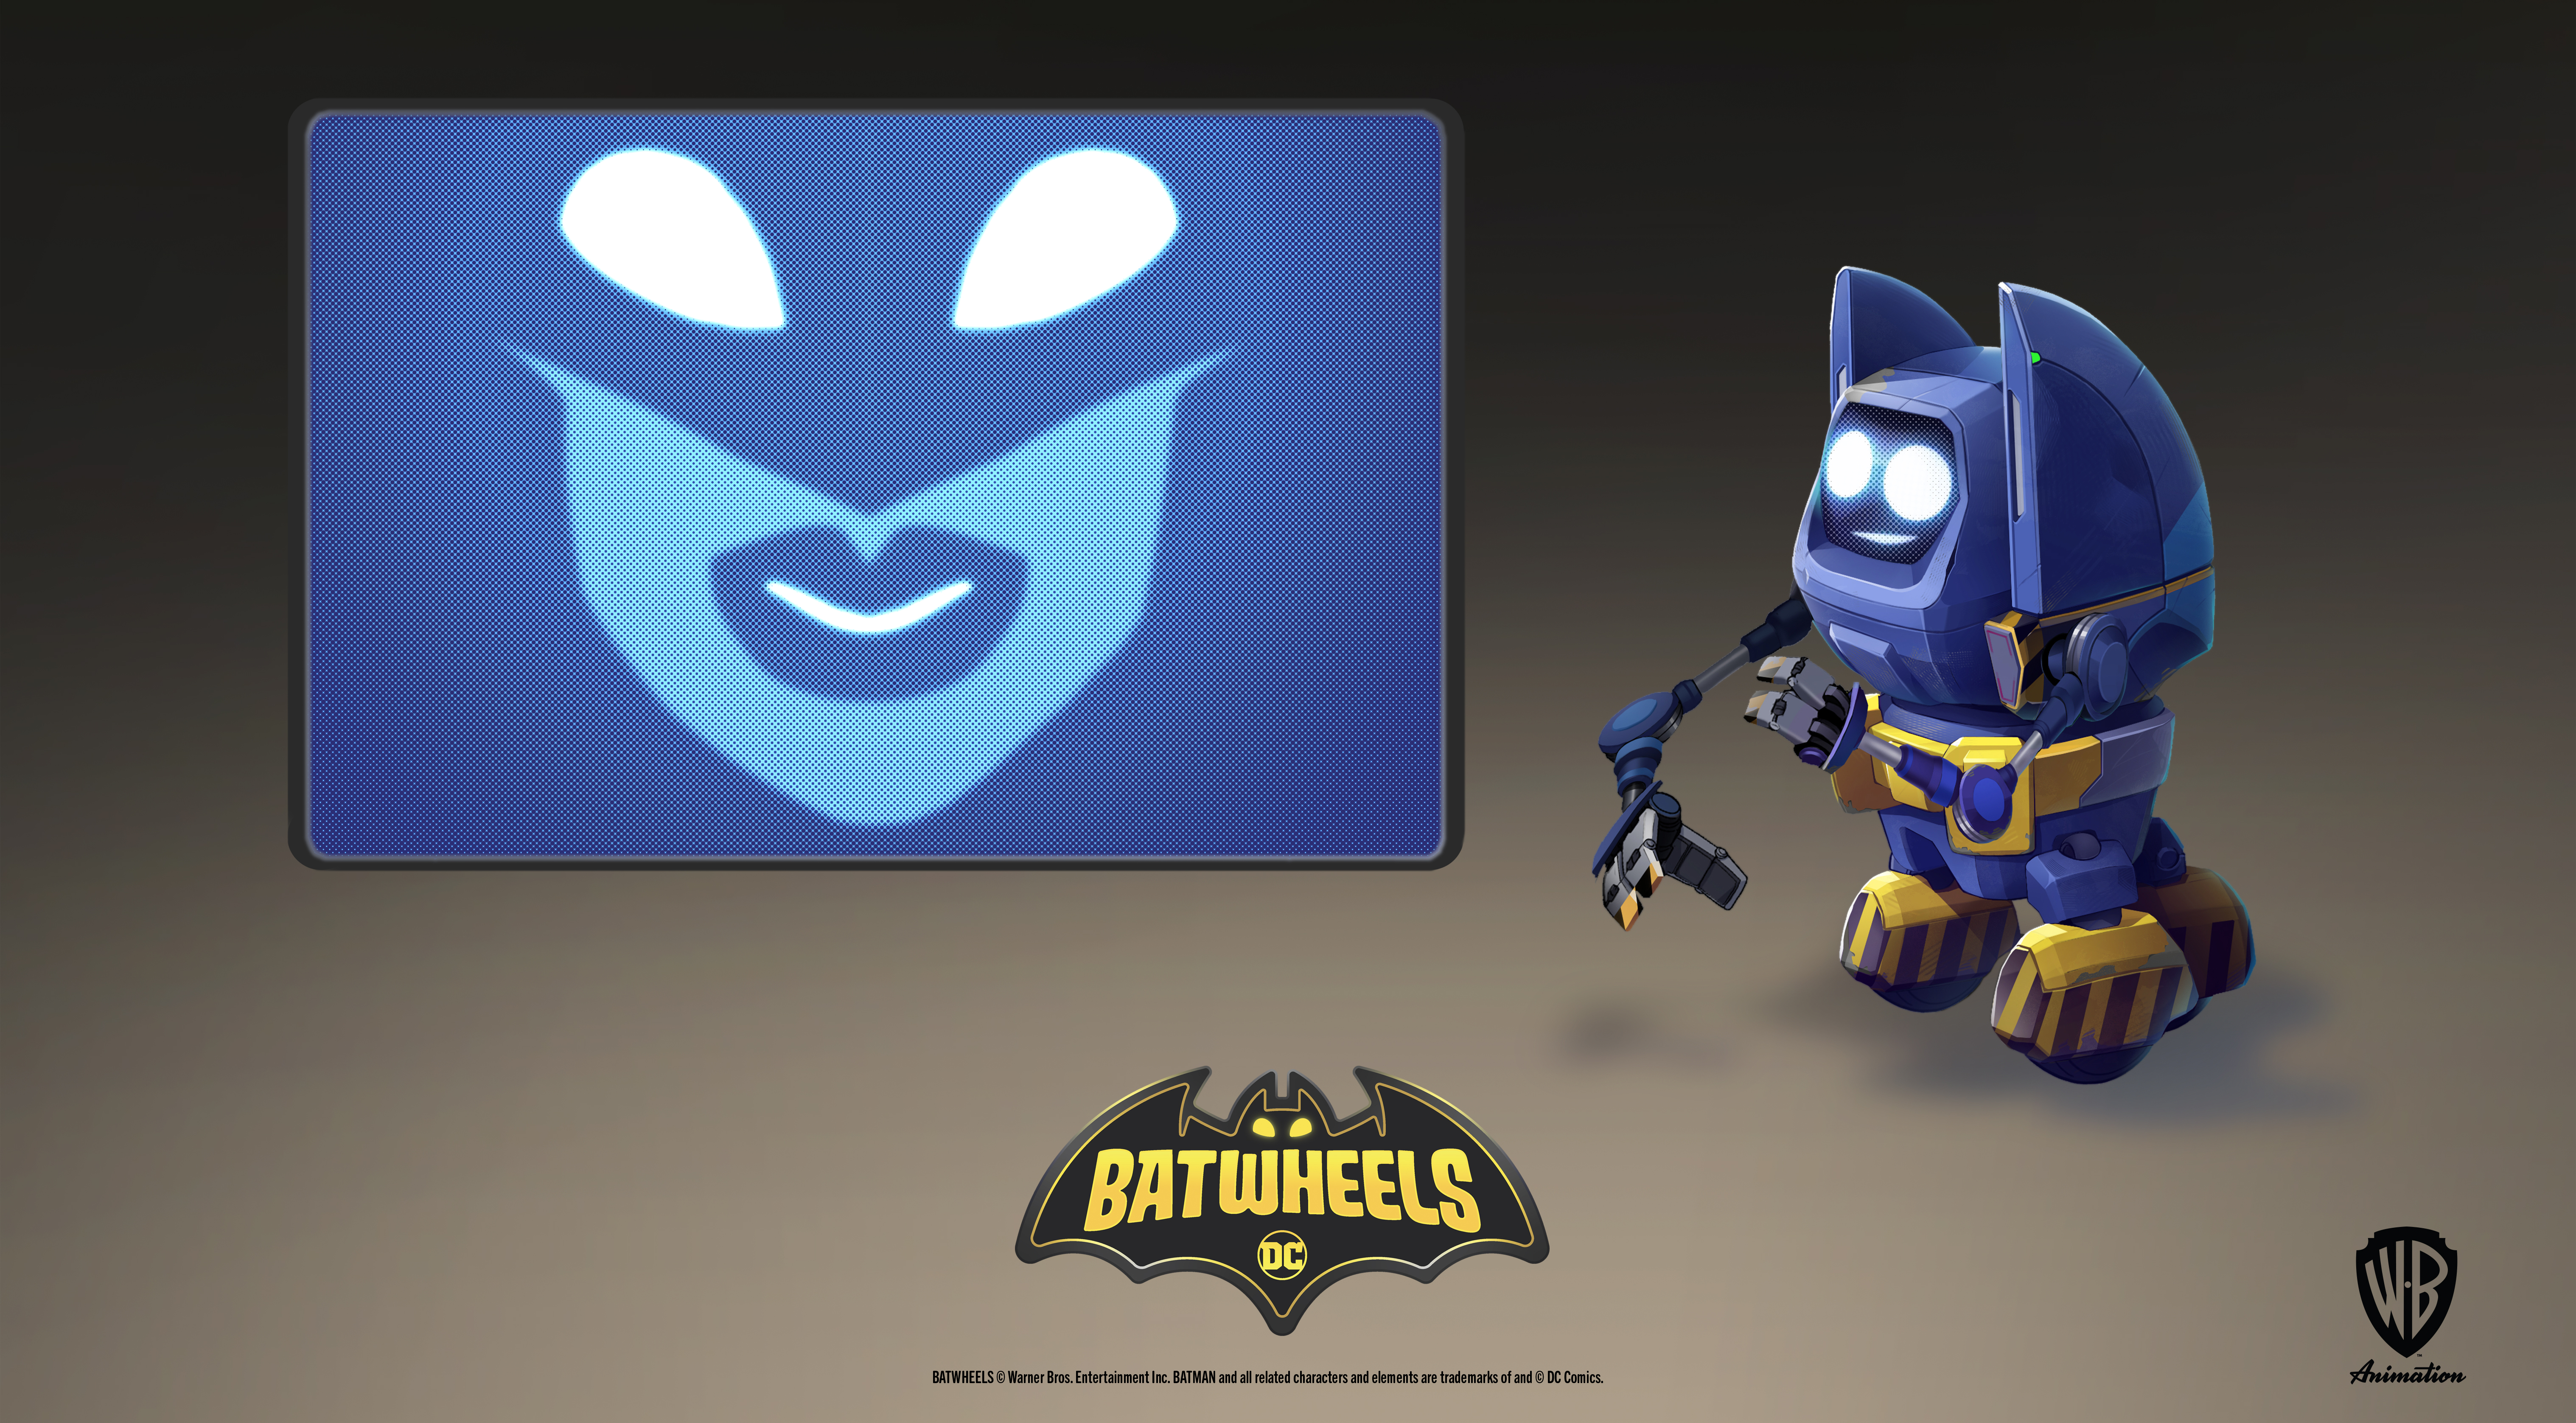 Batwheels Computer_Cast Announcement